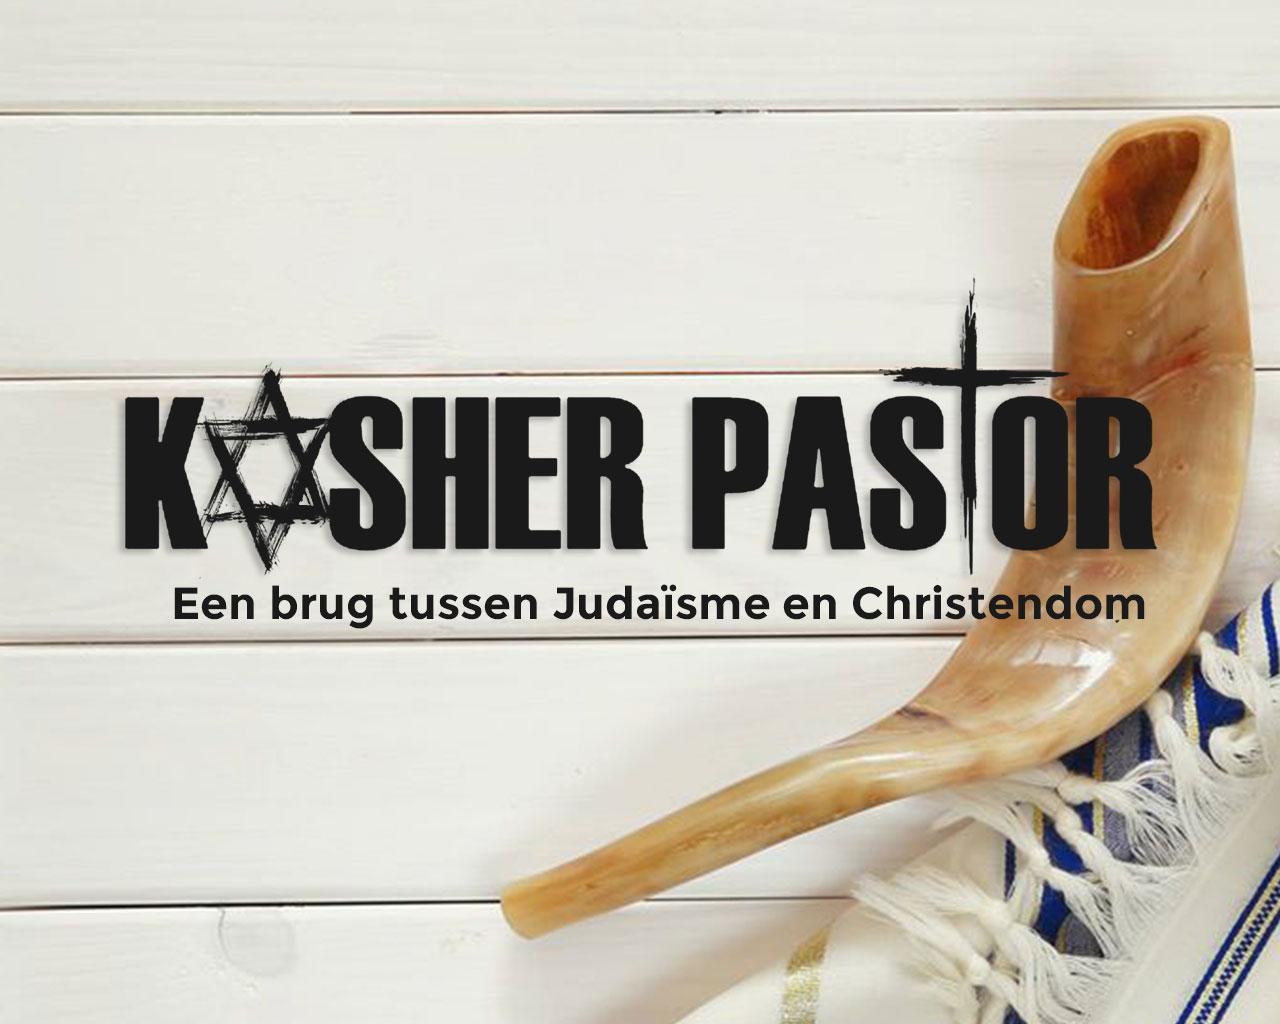 img_shuvu_kosher_pastor_1280x1024_DUT